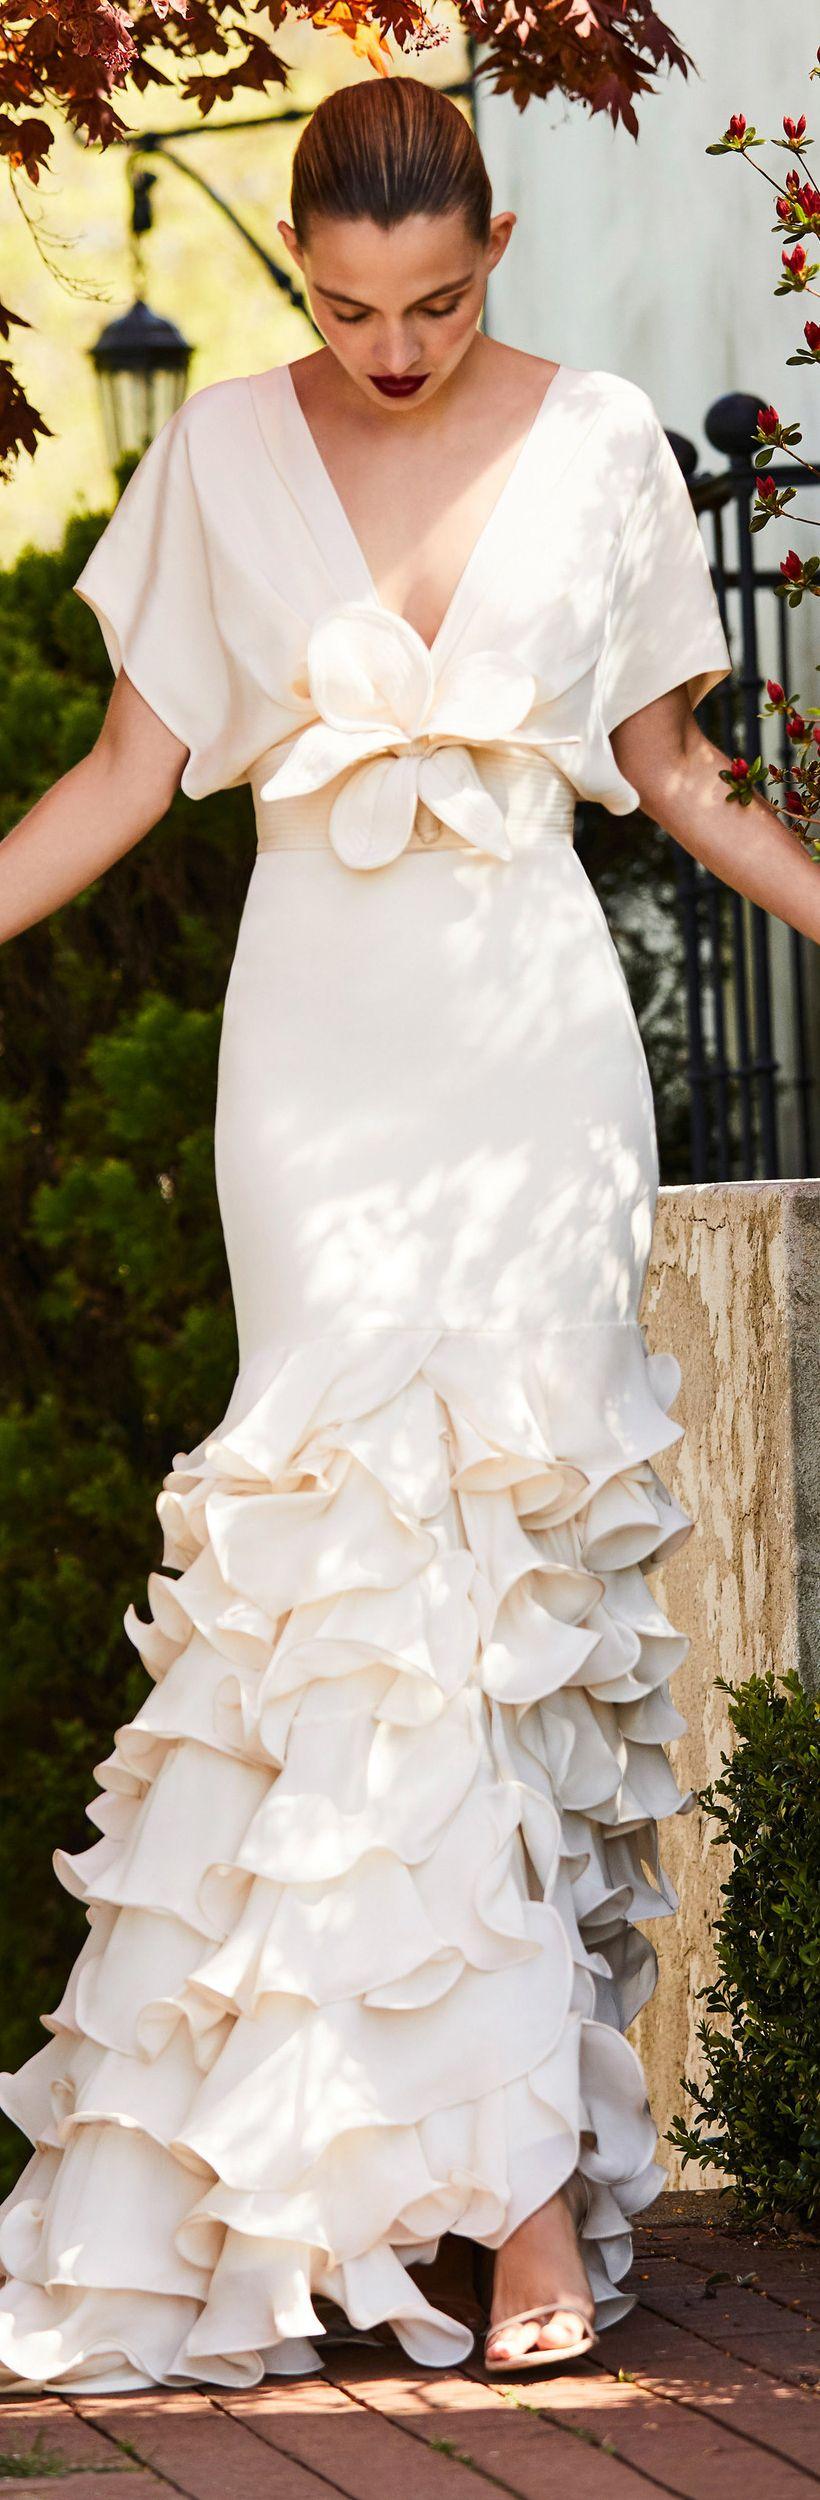 Johanna ortiz ss runway pinterest fashion wedding dress